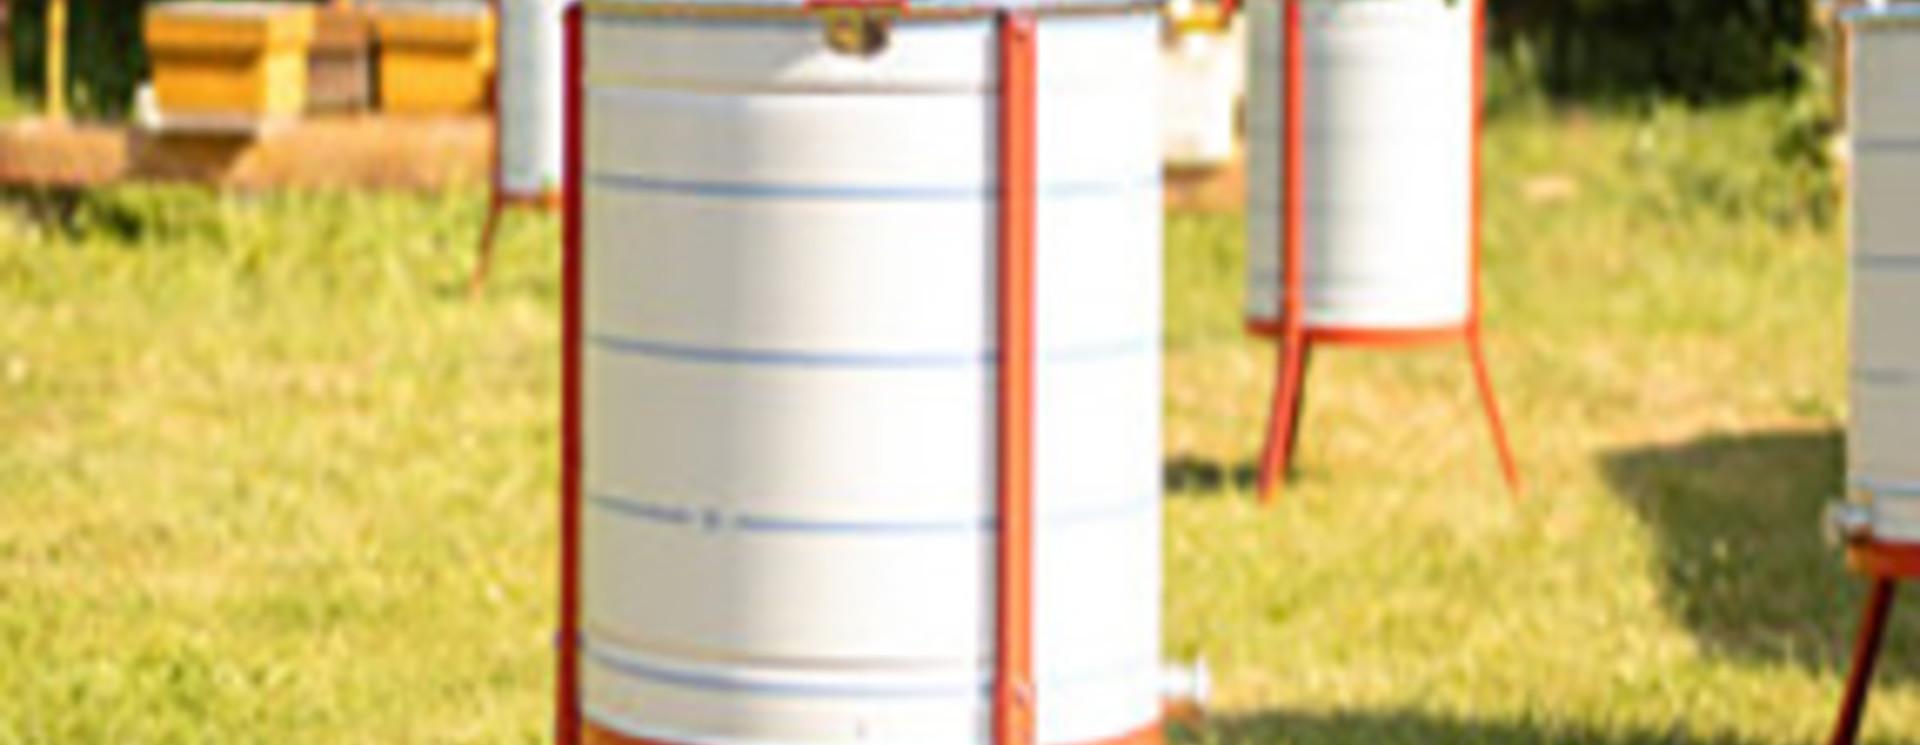 Apini - ripeners and honey extractors